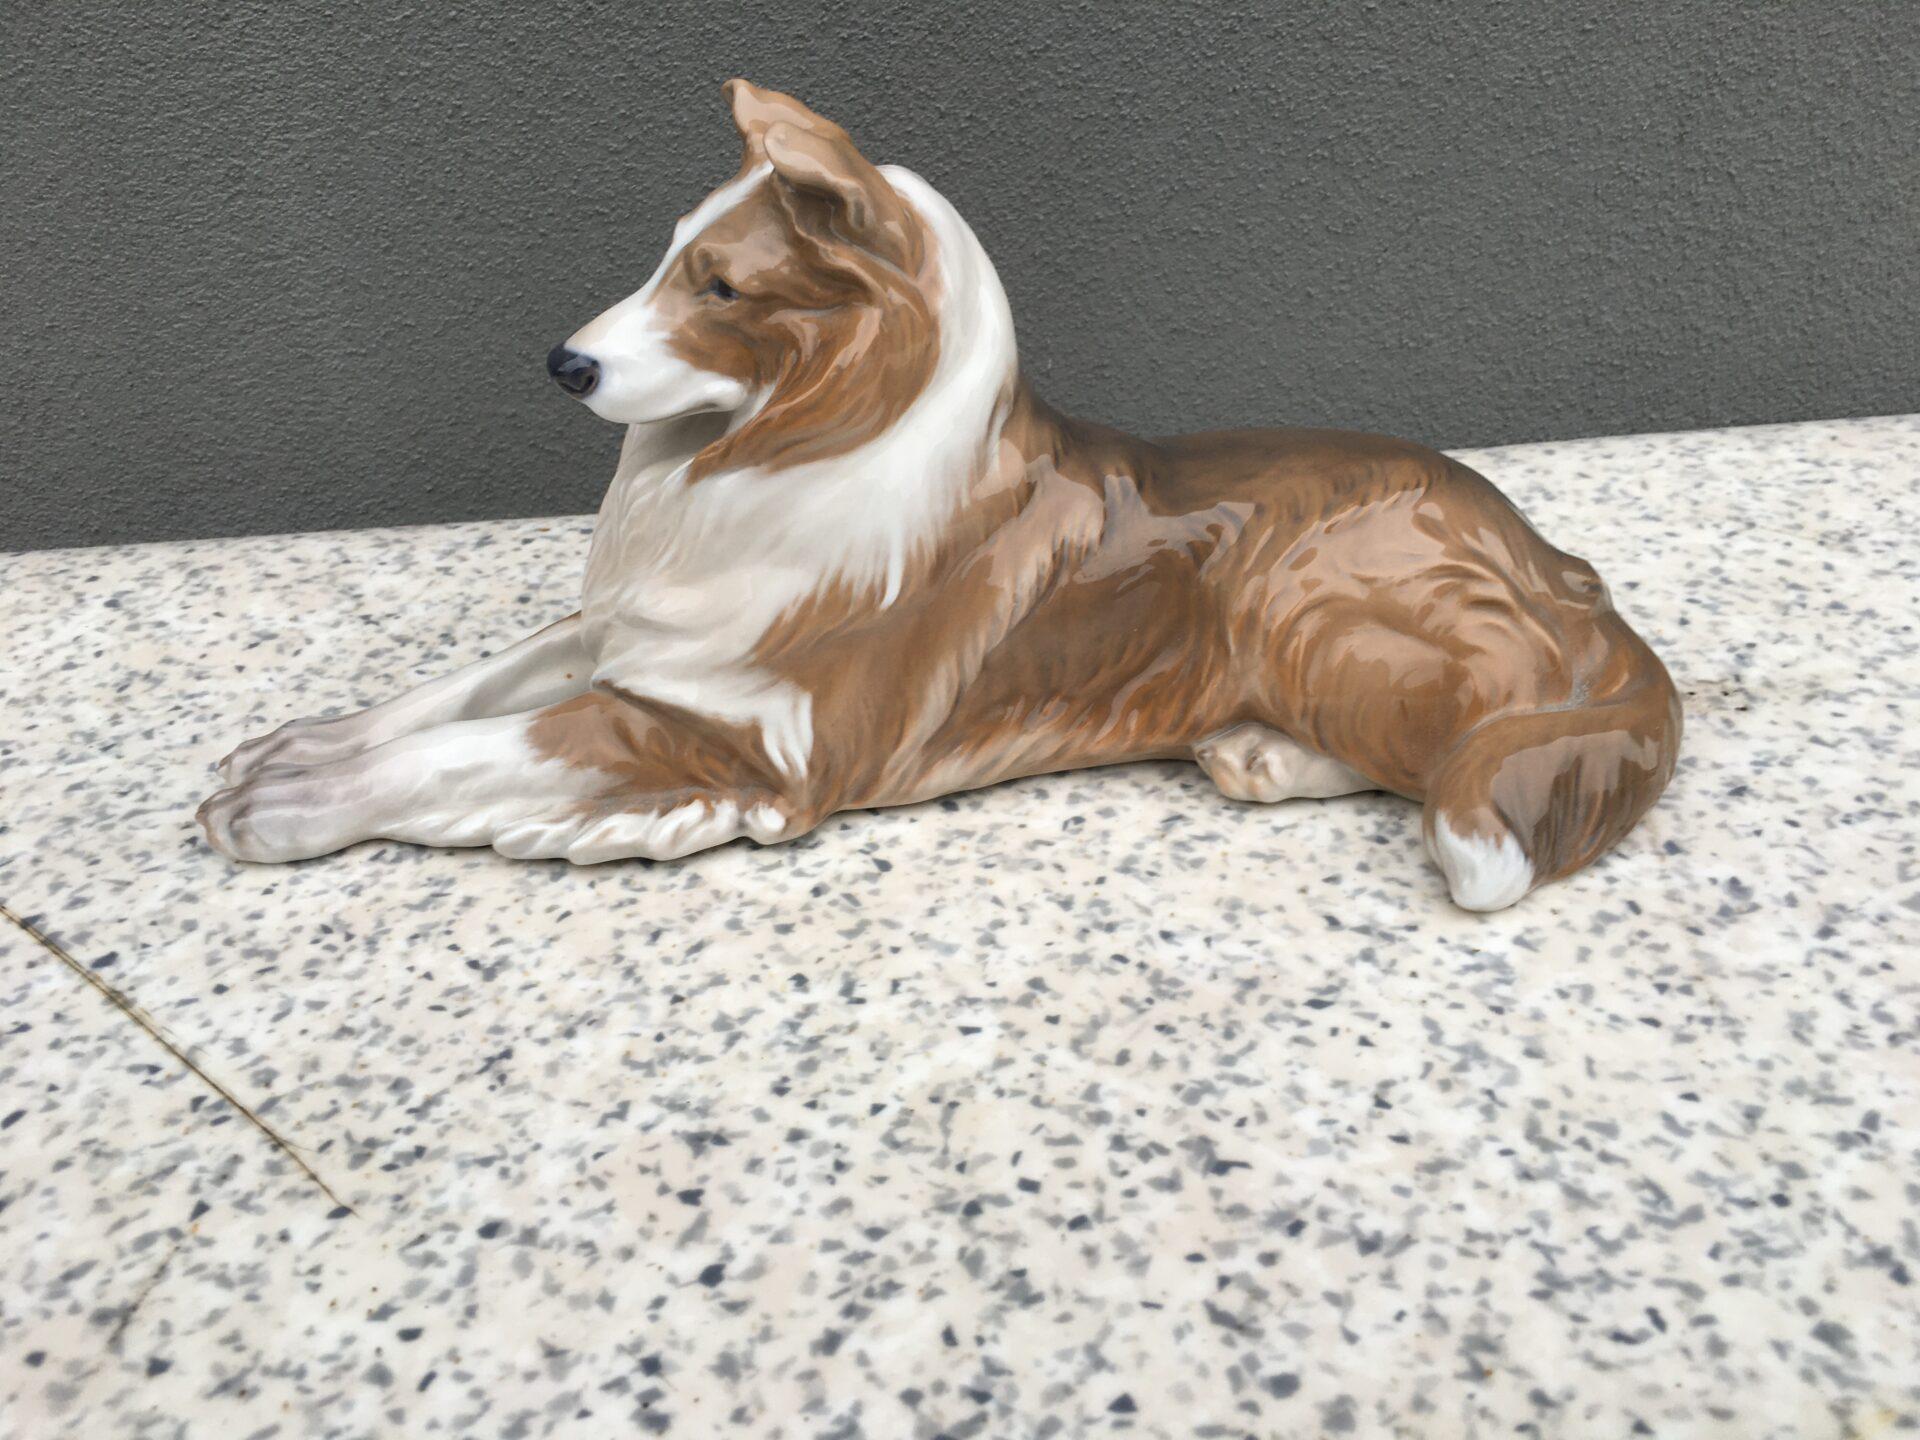 Collie/ Lassie, Kongelig Porcelæn, nr, 1701, 1. sortering, fejlfri, pris 1000kr